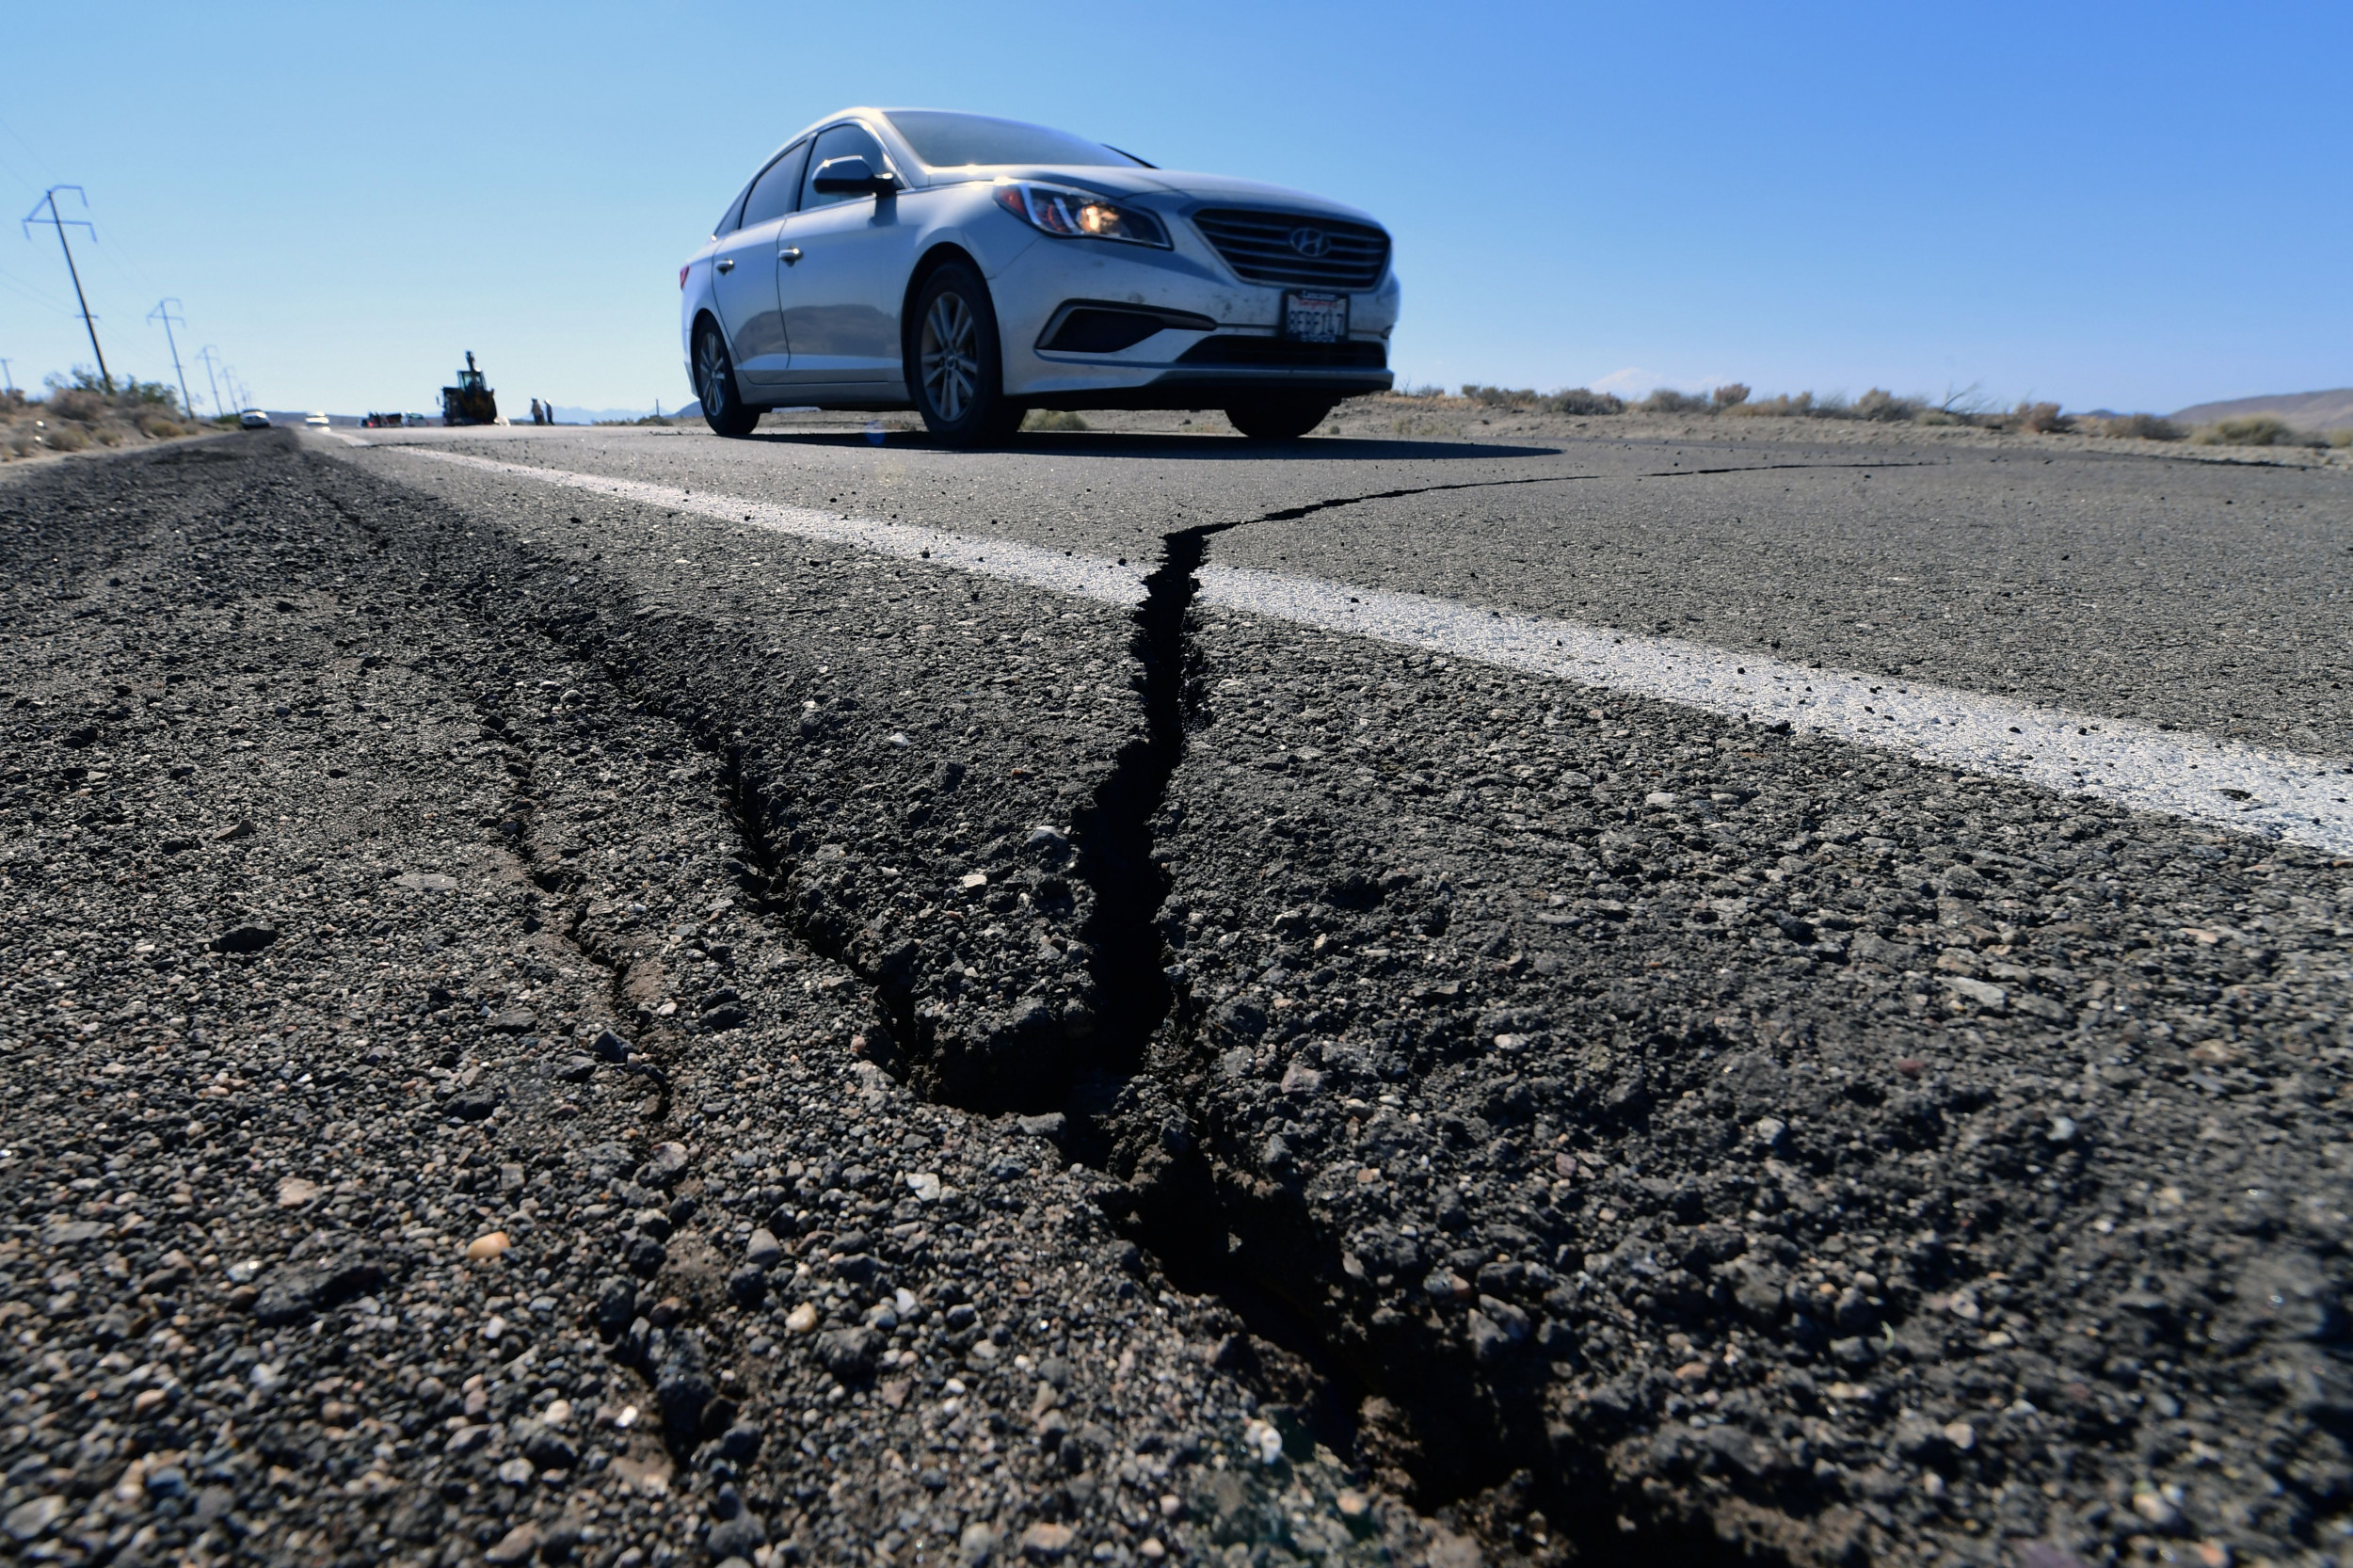 California Earthquake: 5.4 Magnitude Tremor Strikes State ...